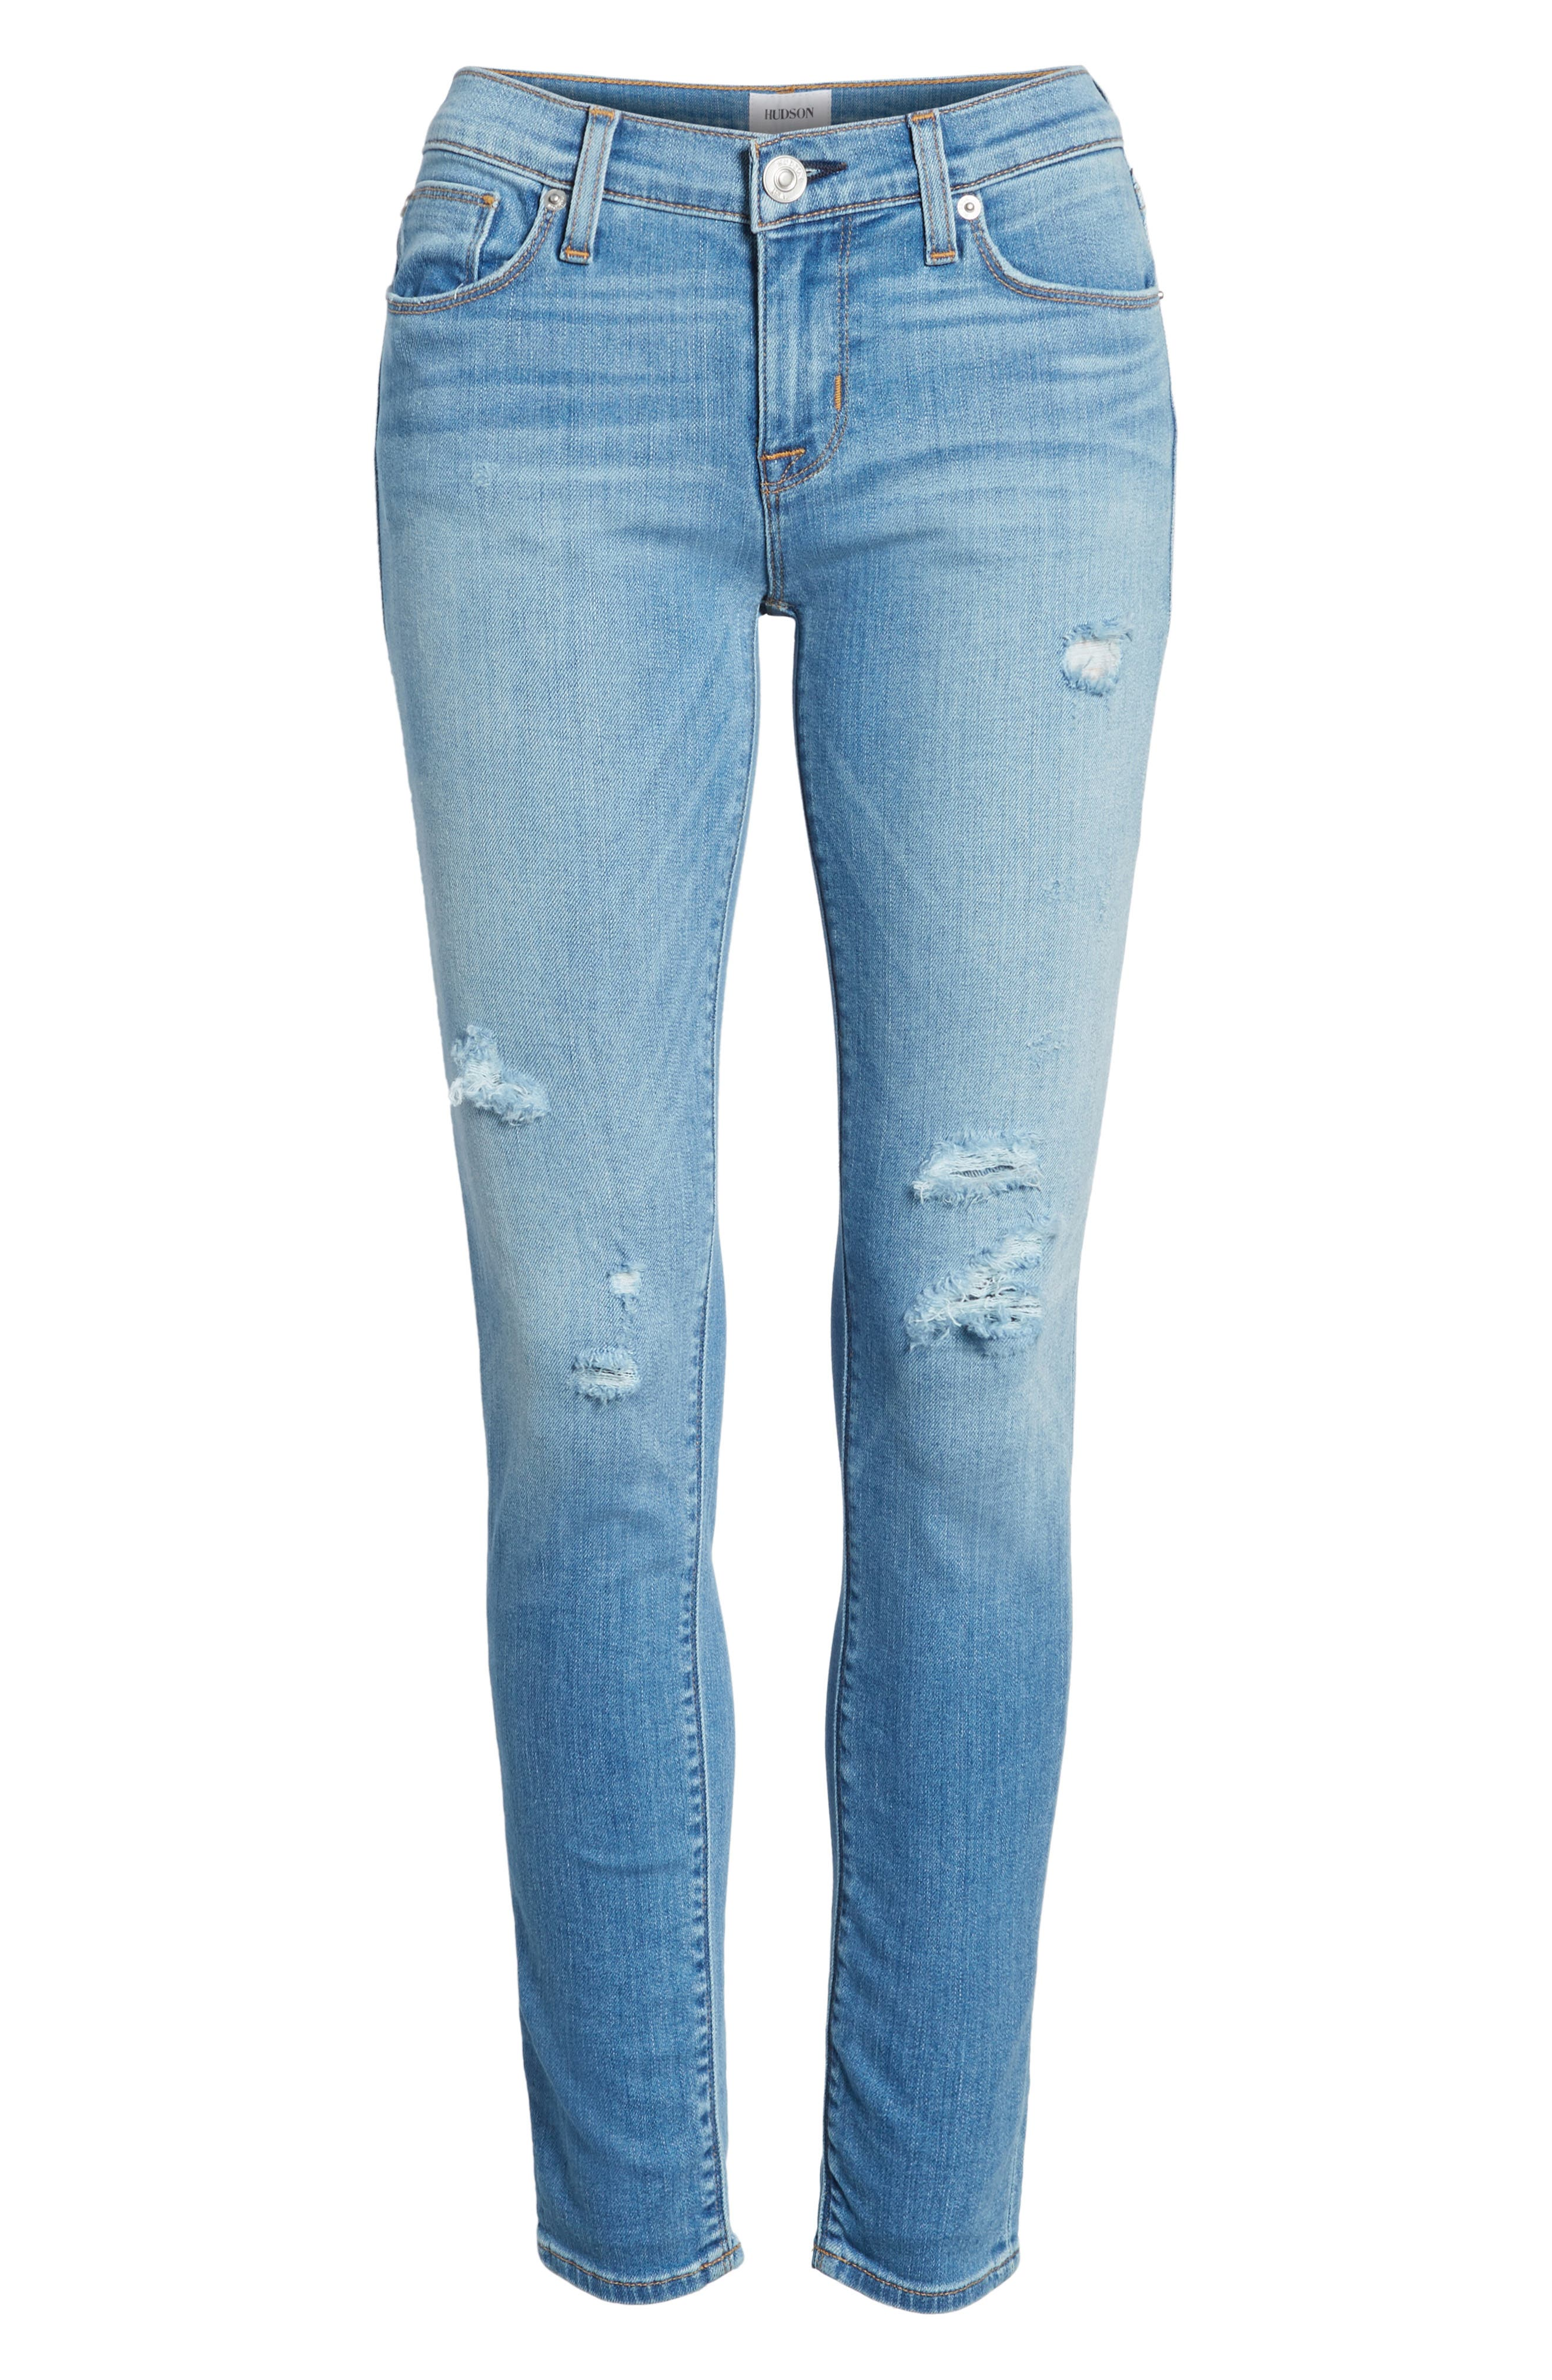 Krista Ankle Super Skinny Jeans,                             Alternate thumbnail 7, color,                             420